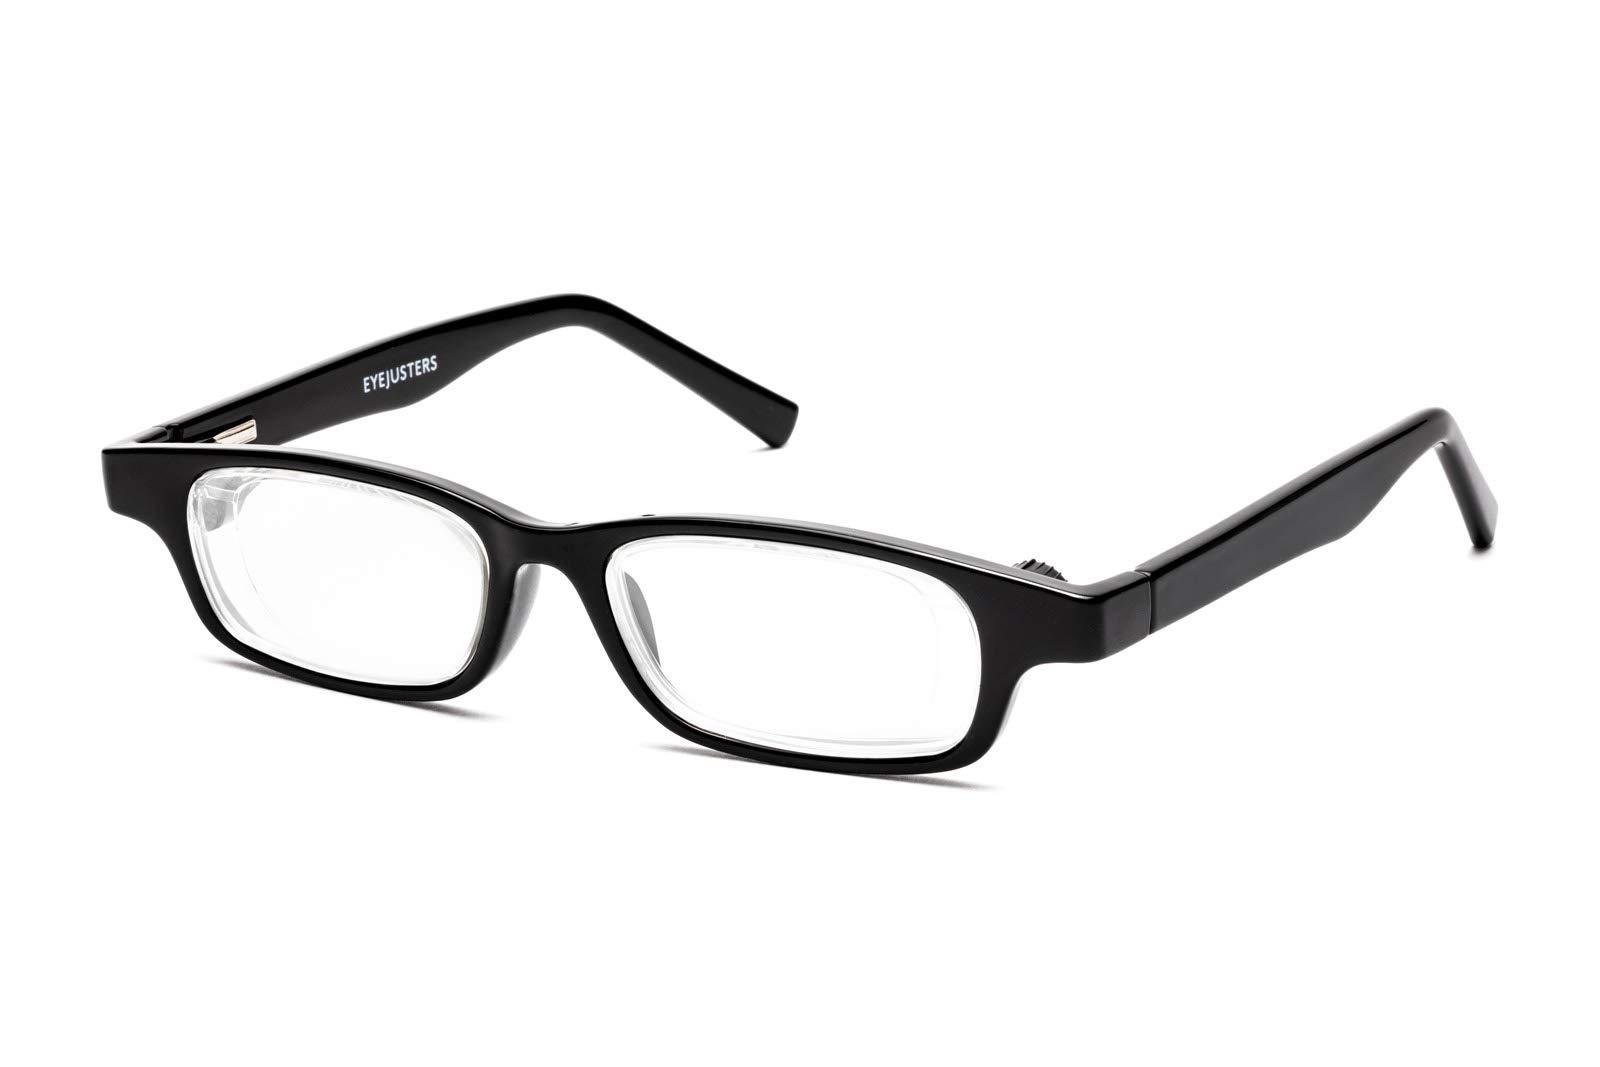 Eyejusters Self-Adjustable Glasses, Oxford Edition, Black